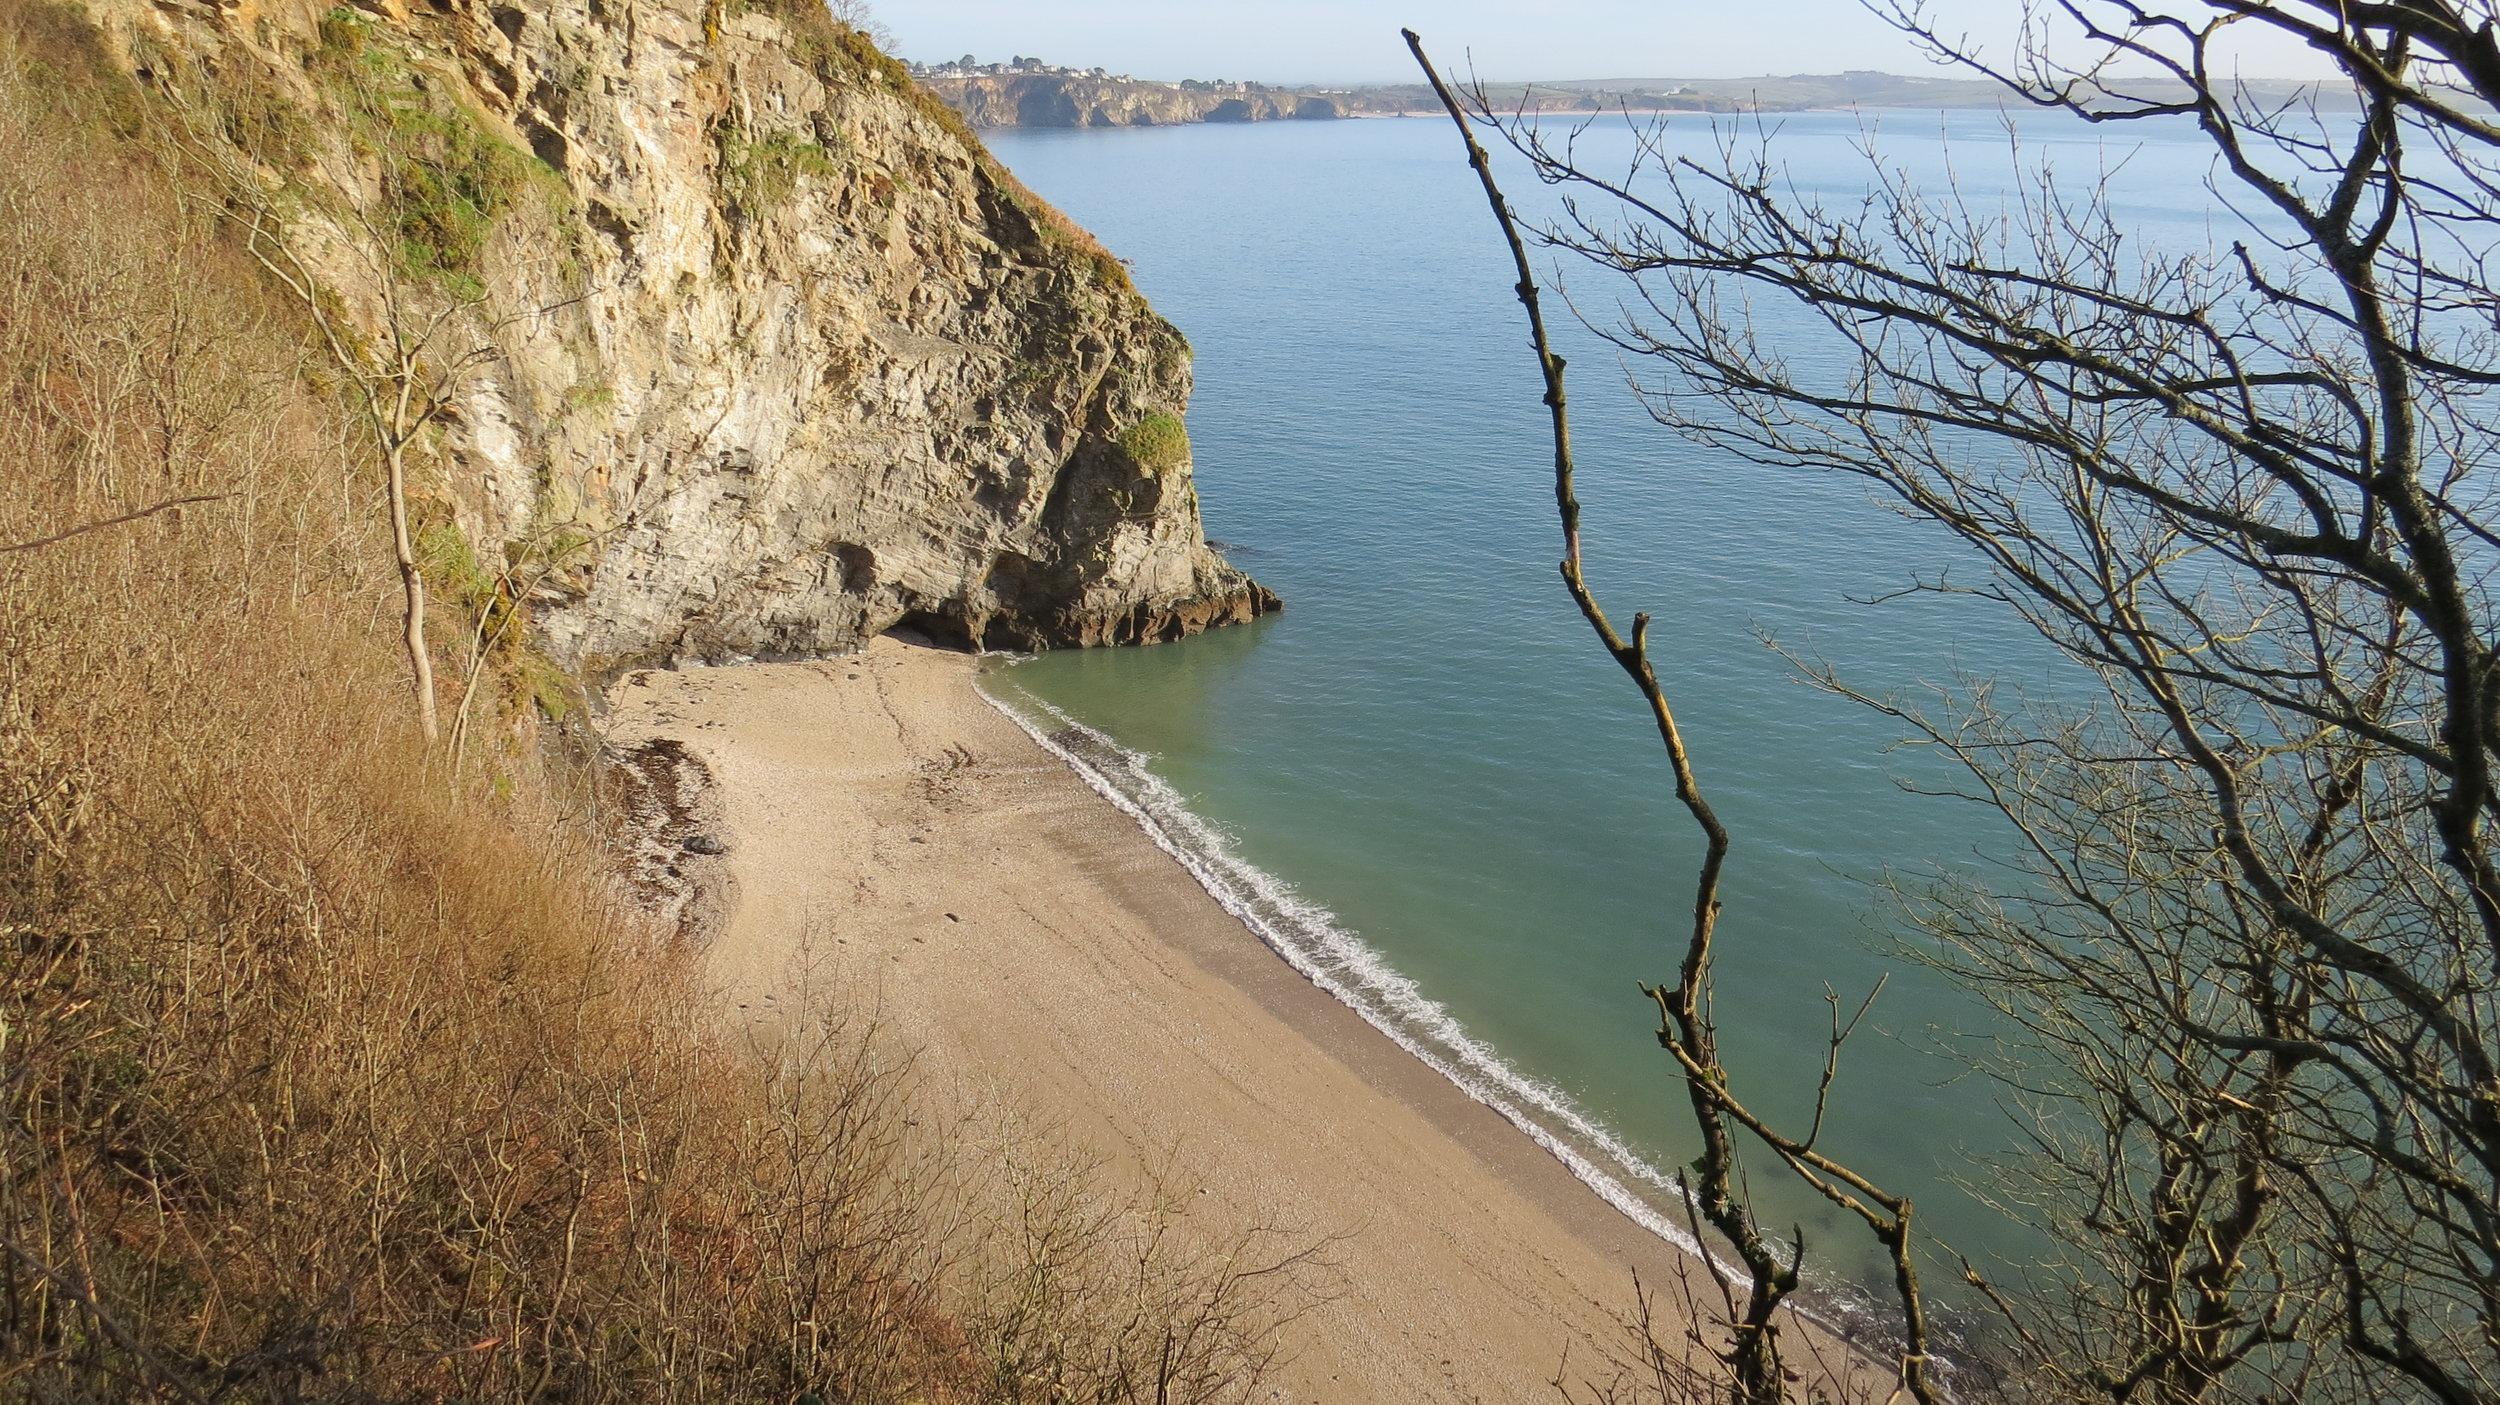 Glimpse of Beach